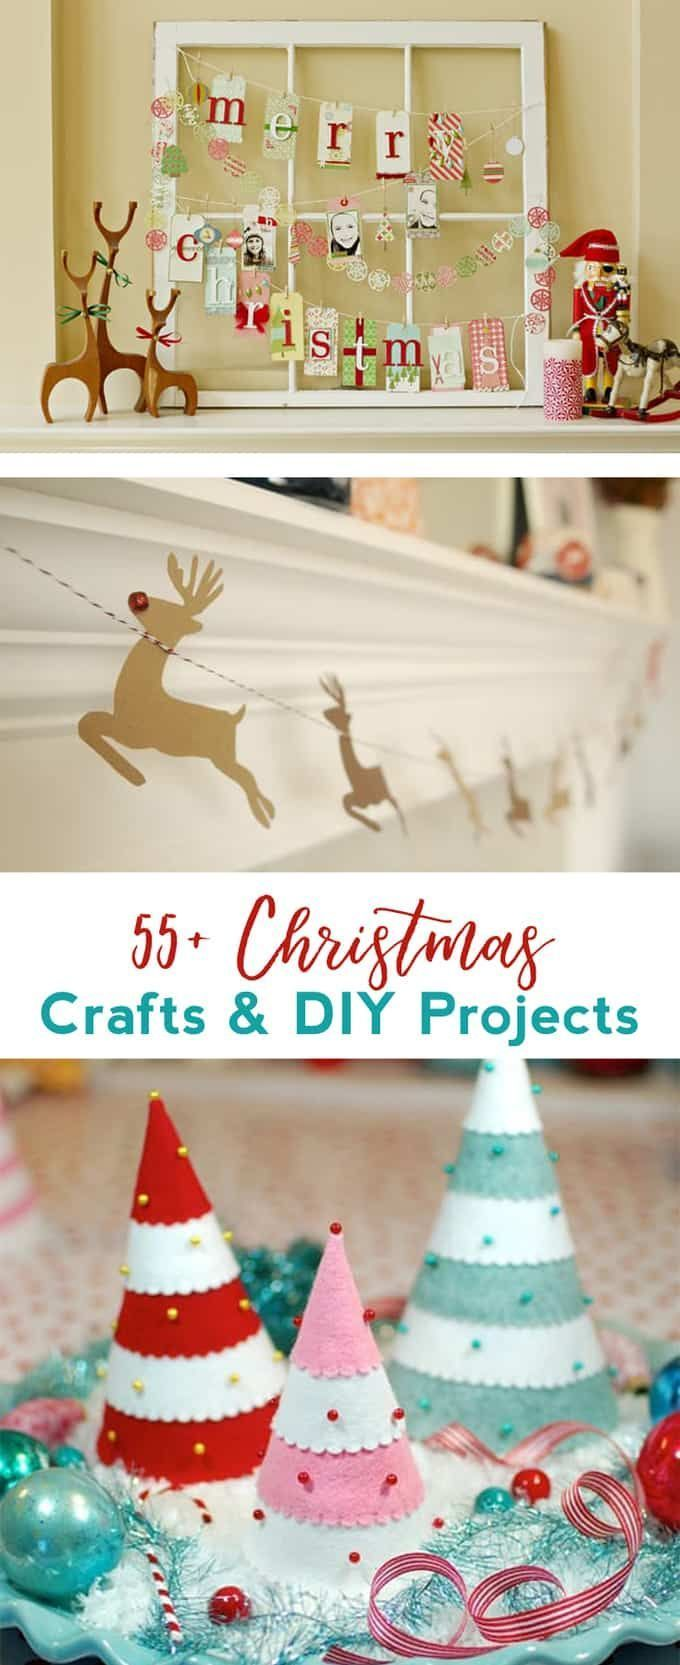 55+ Favorite Christmas Crafts & DIY Tutorials | DIY Home & Garden ...